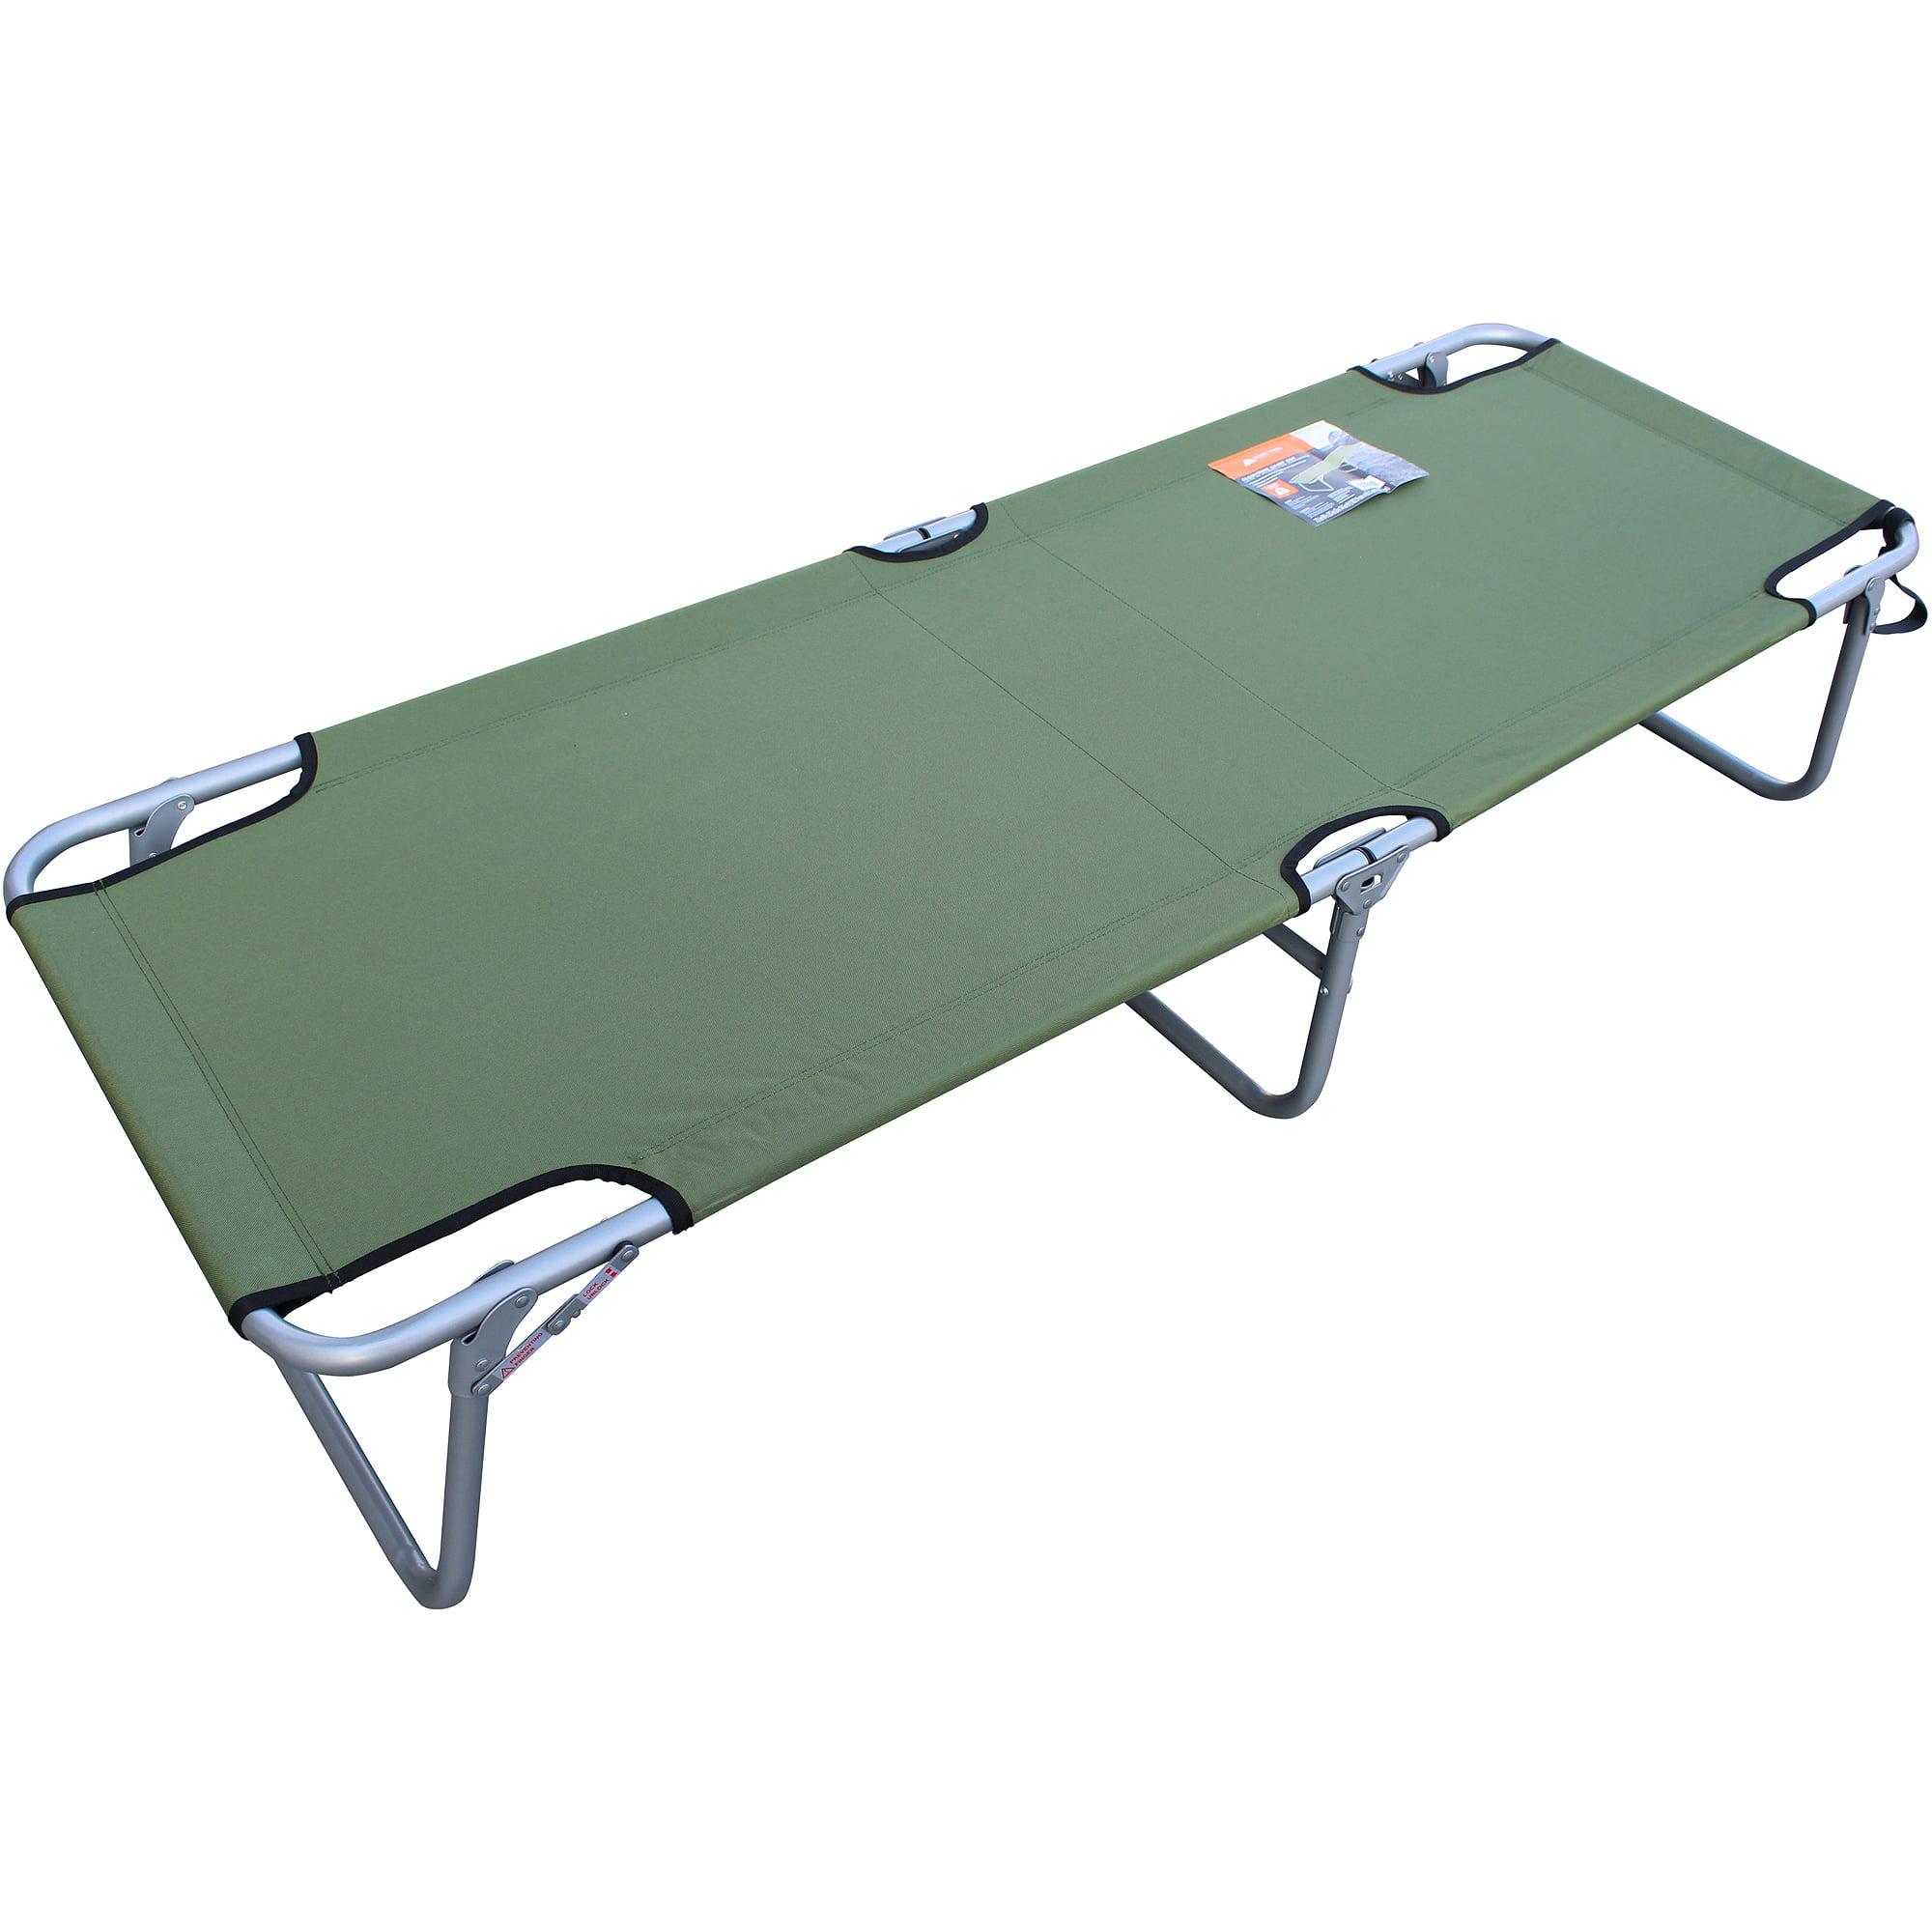 Single Folding Camp Bed LightWeight Portable Green Steel Frame